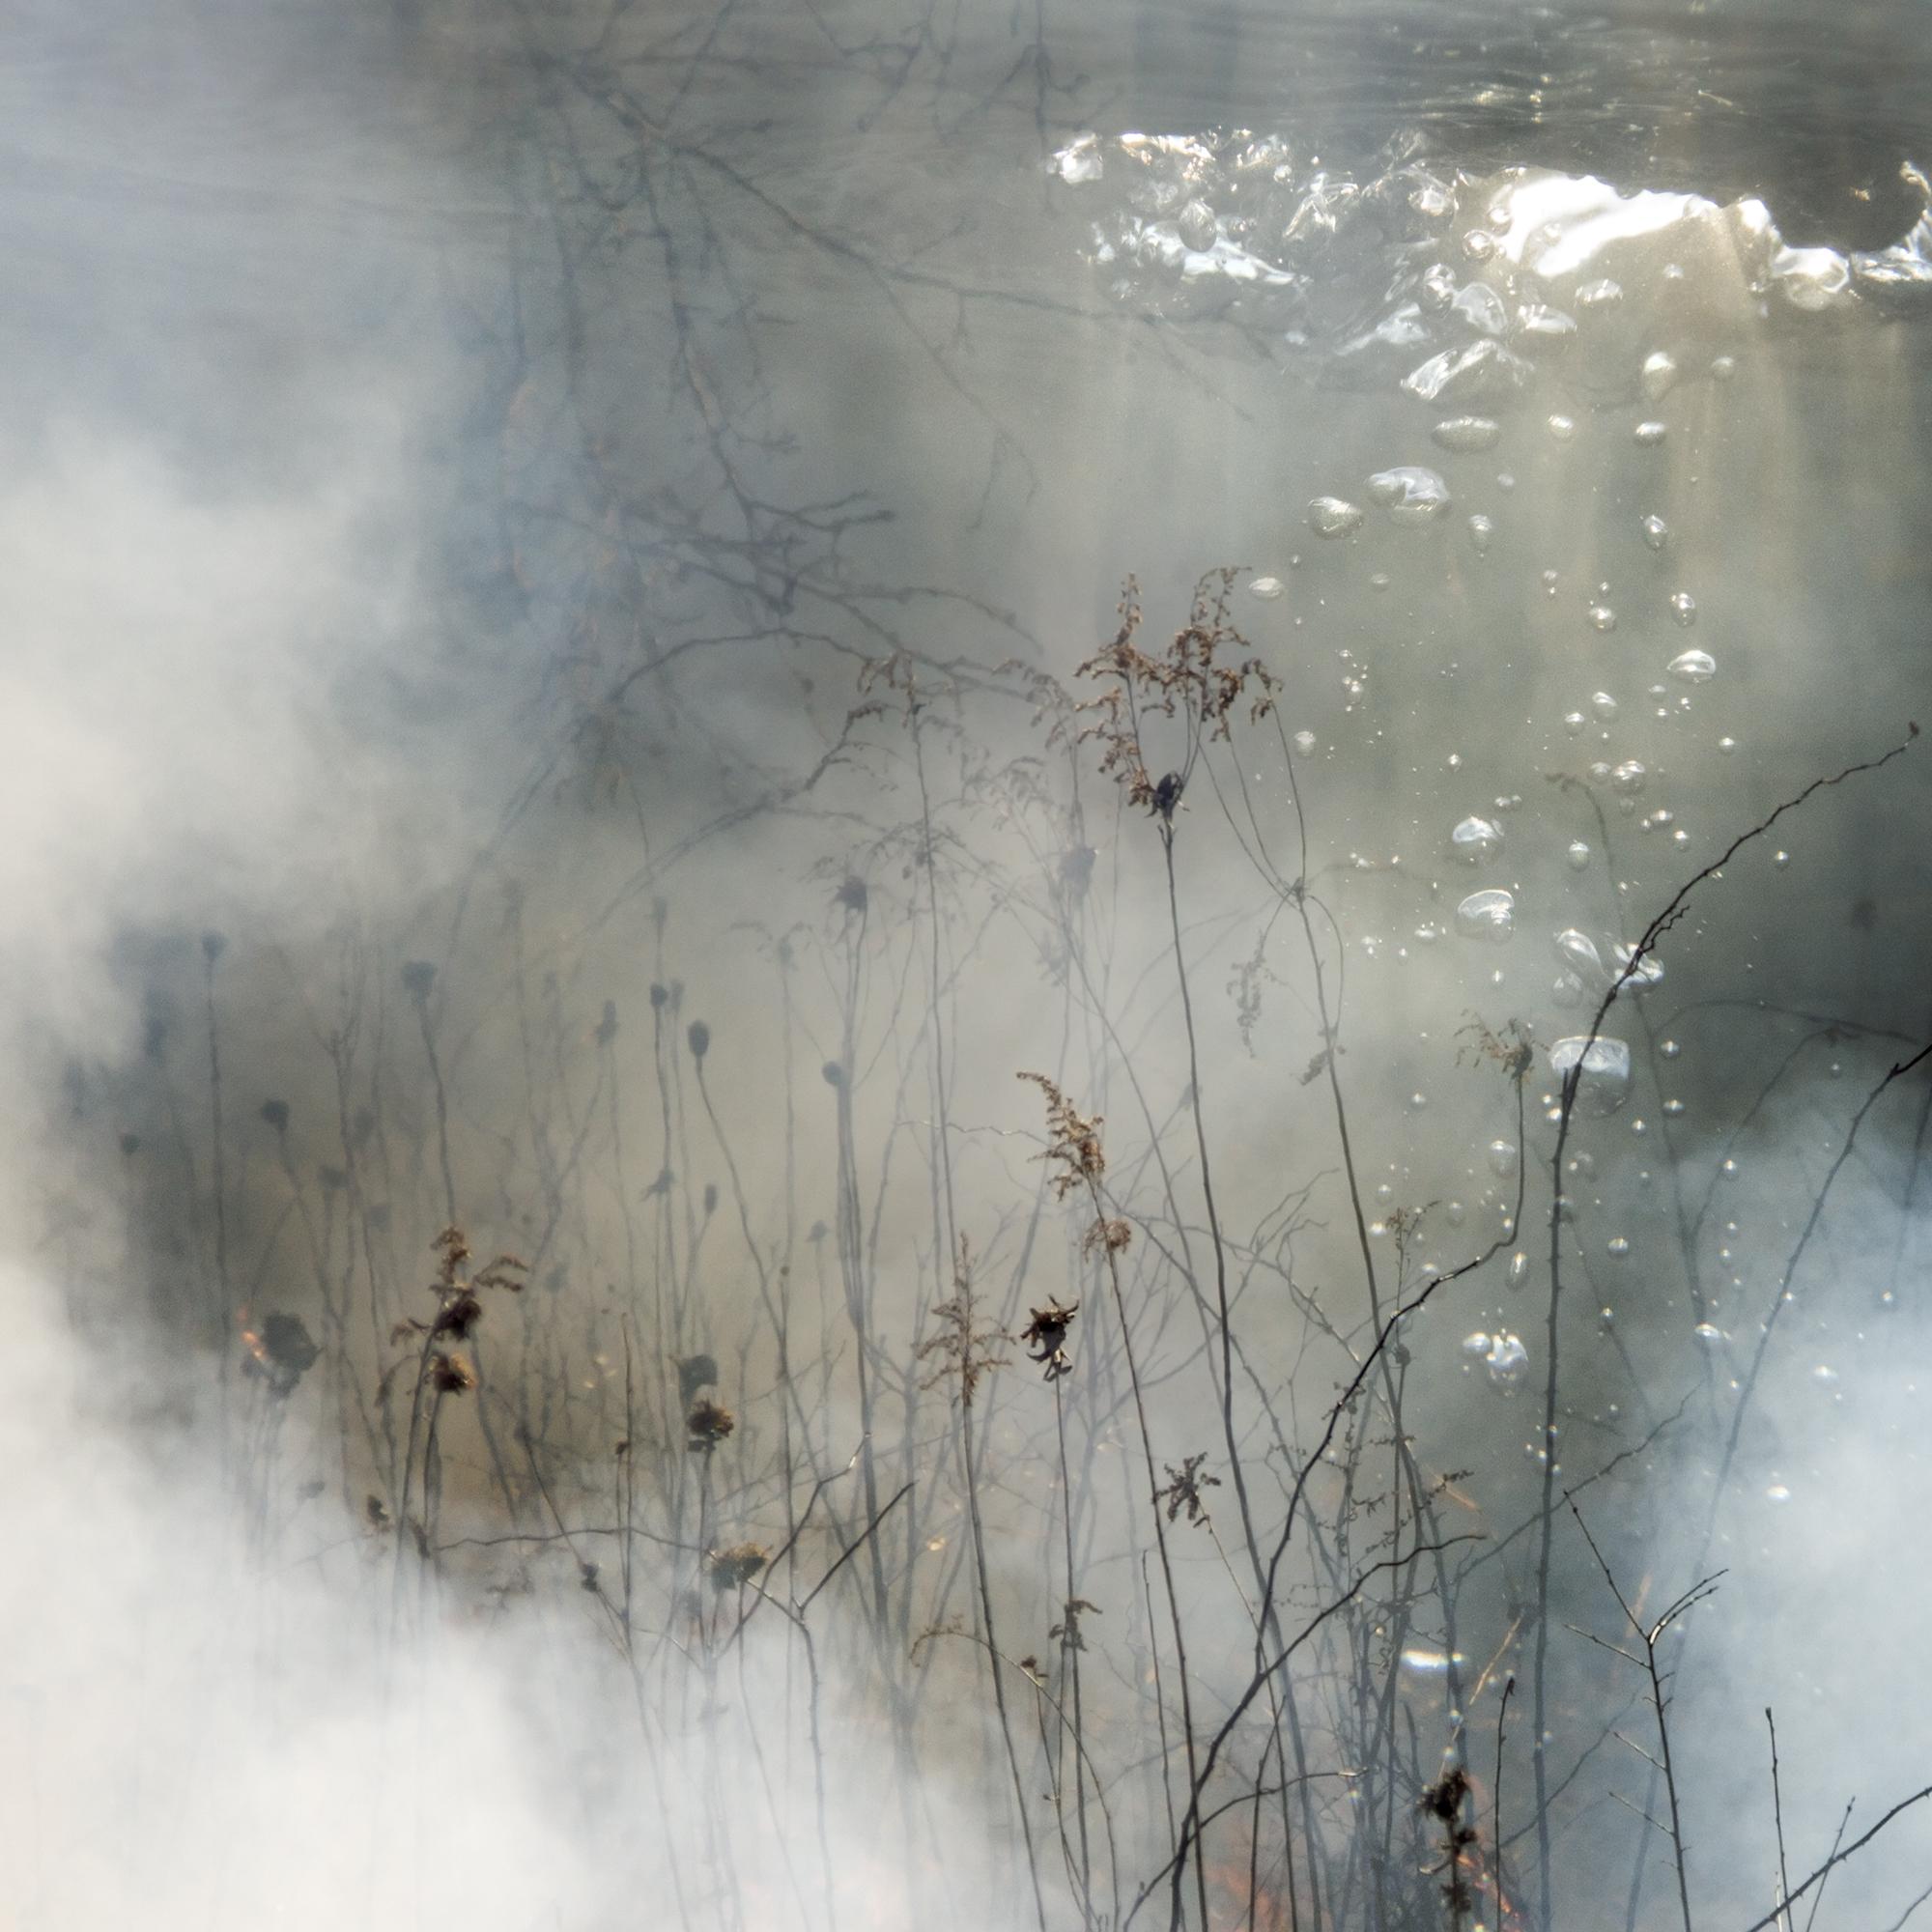 Fire/Water No. 7